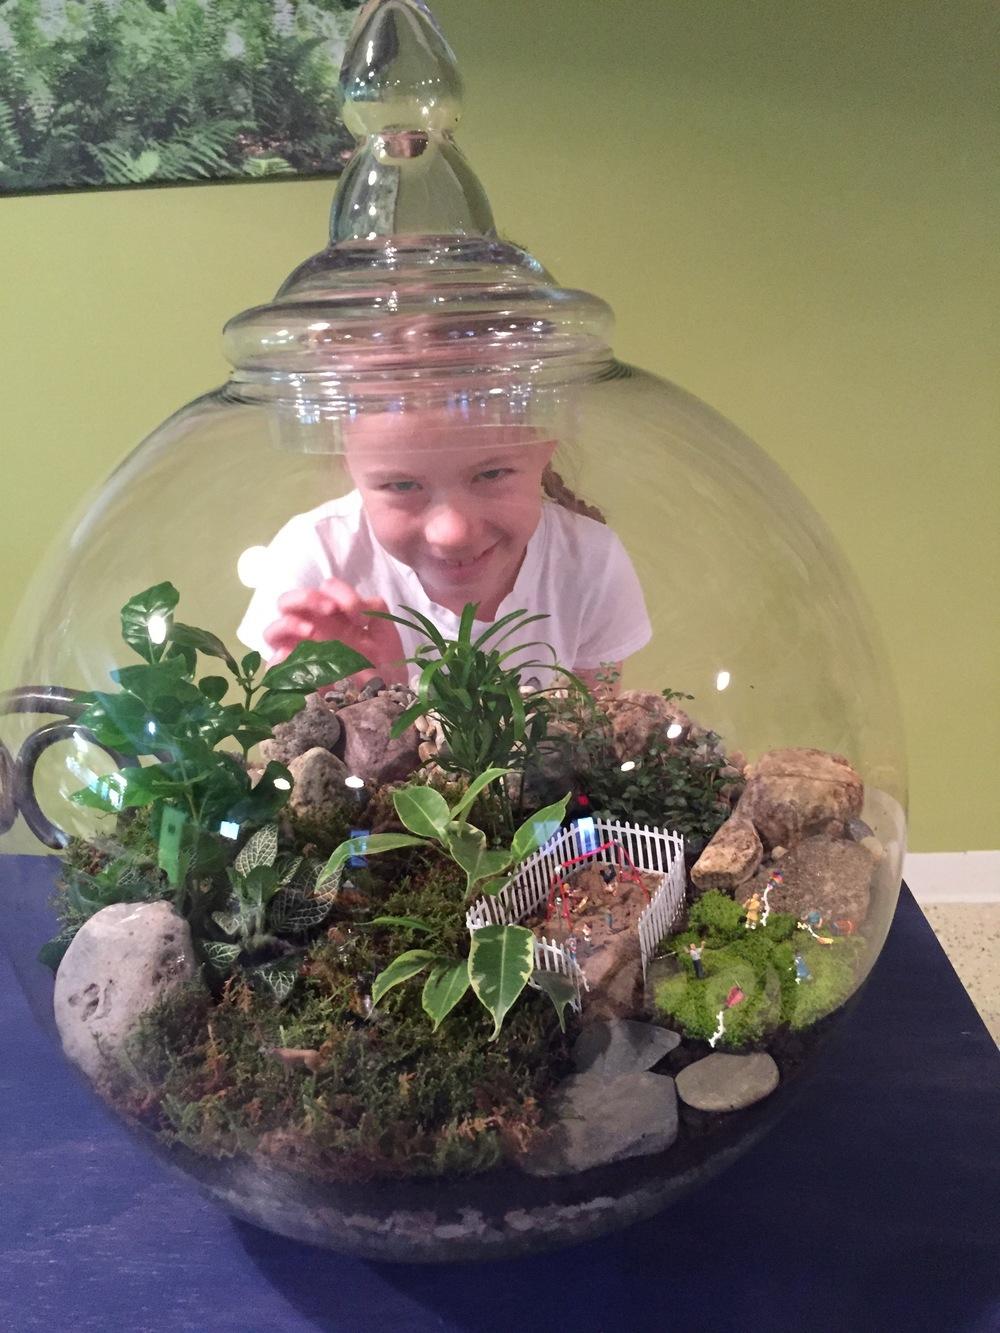 Kathleen's daughter peeking through a huge terrarium.